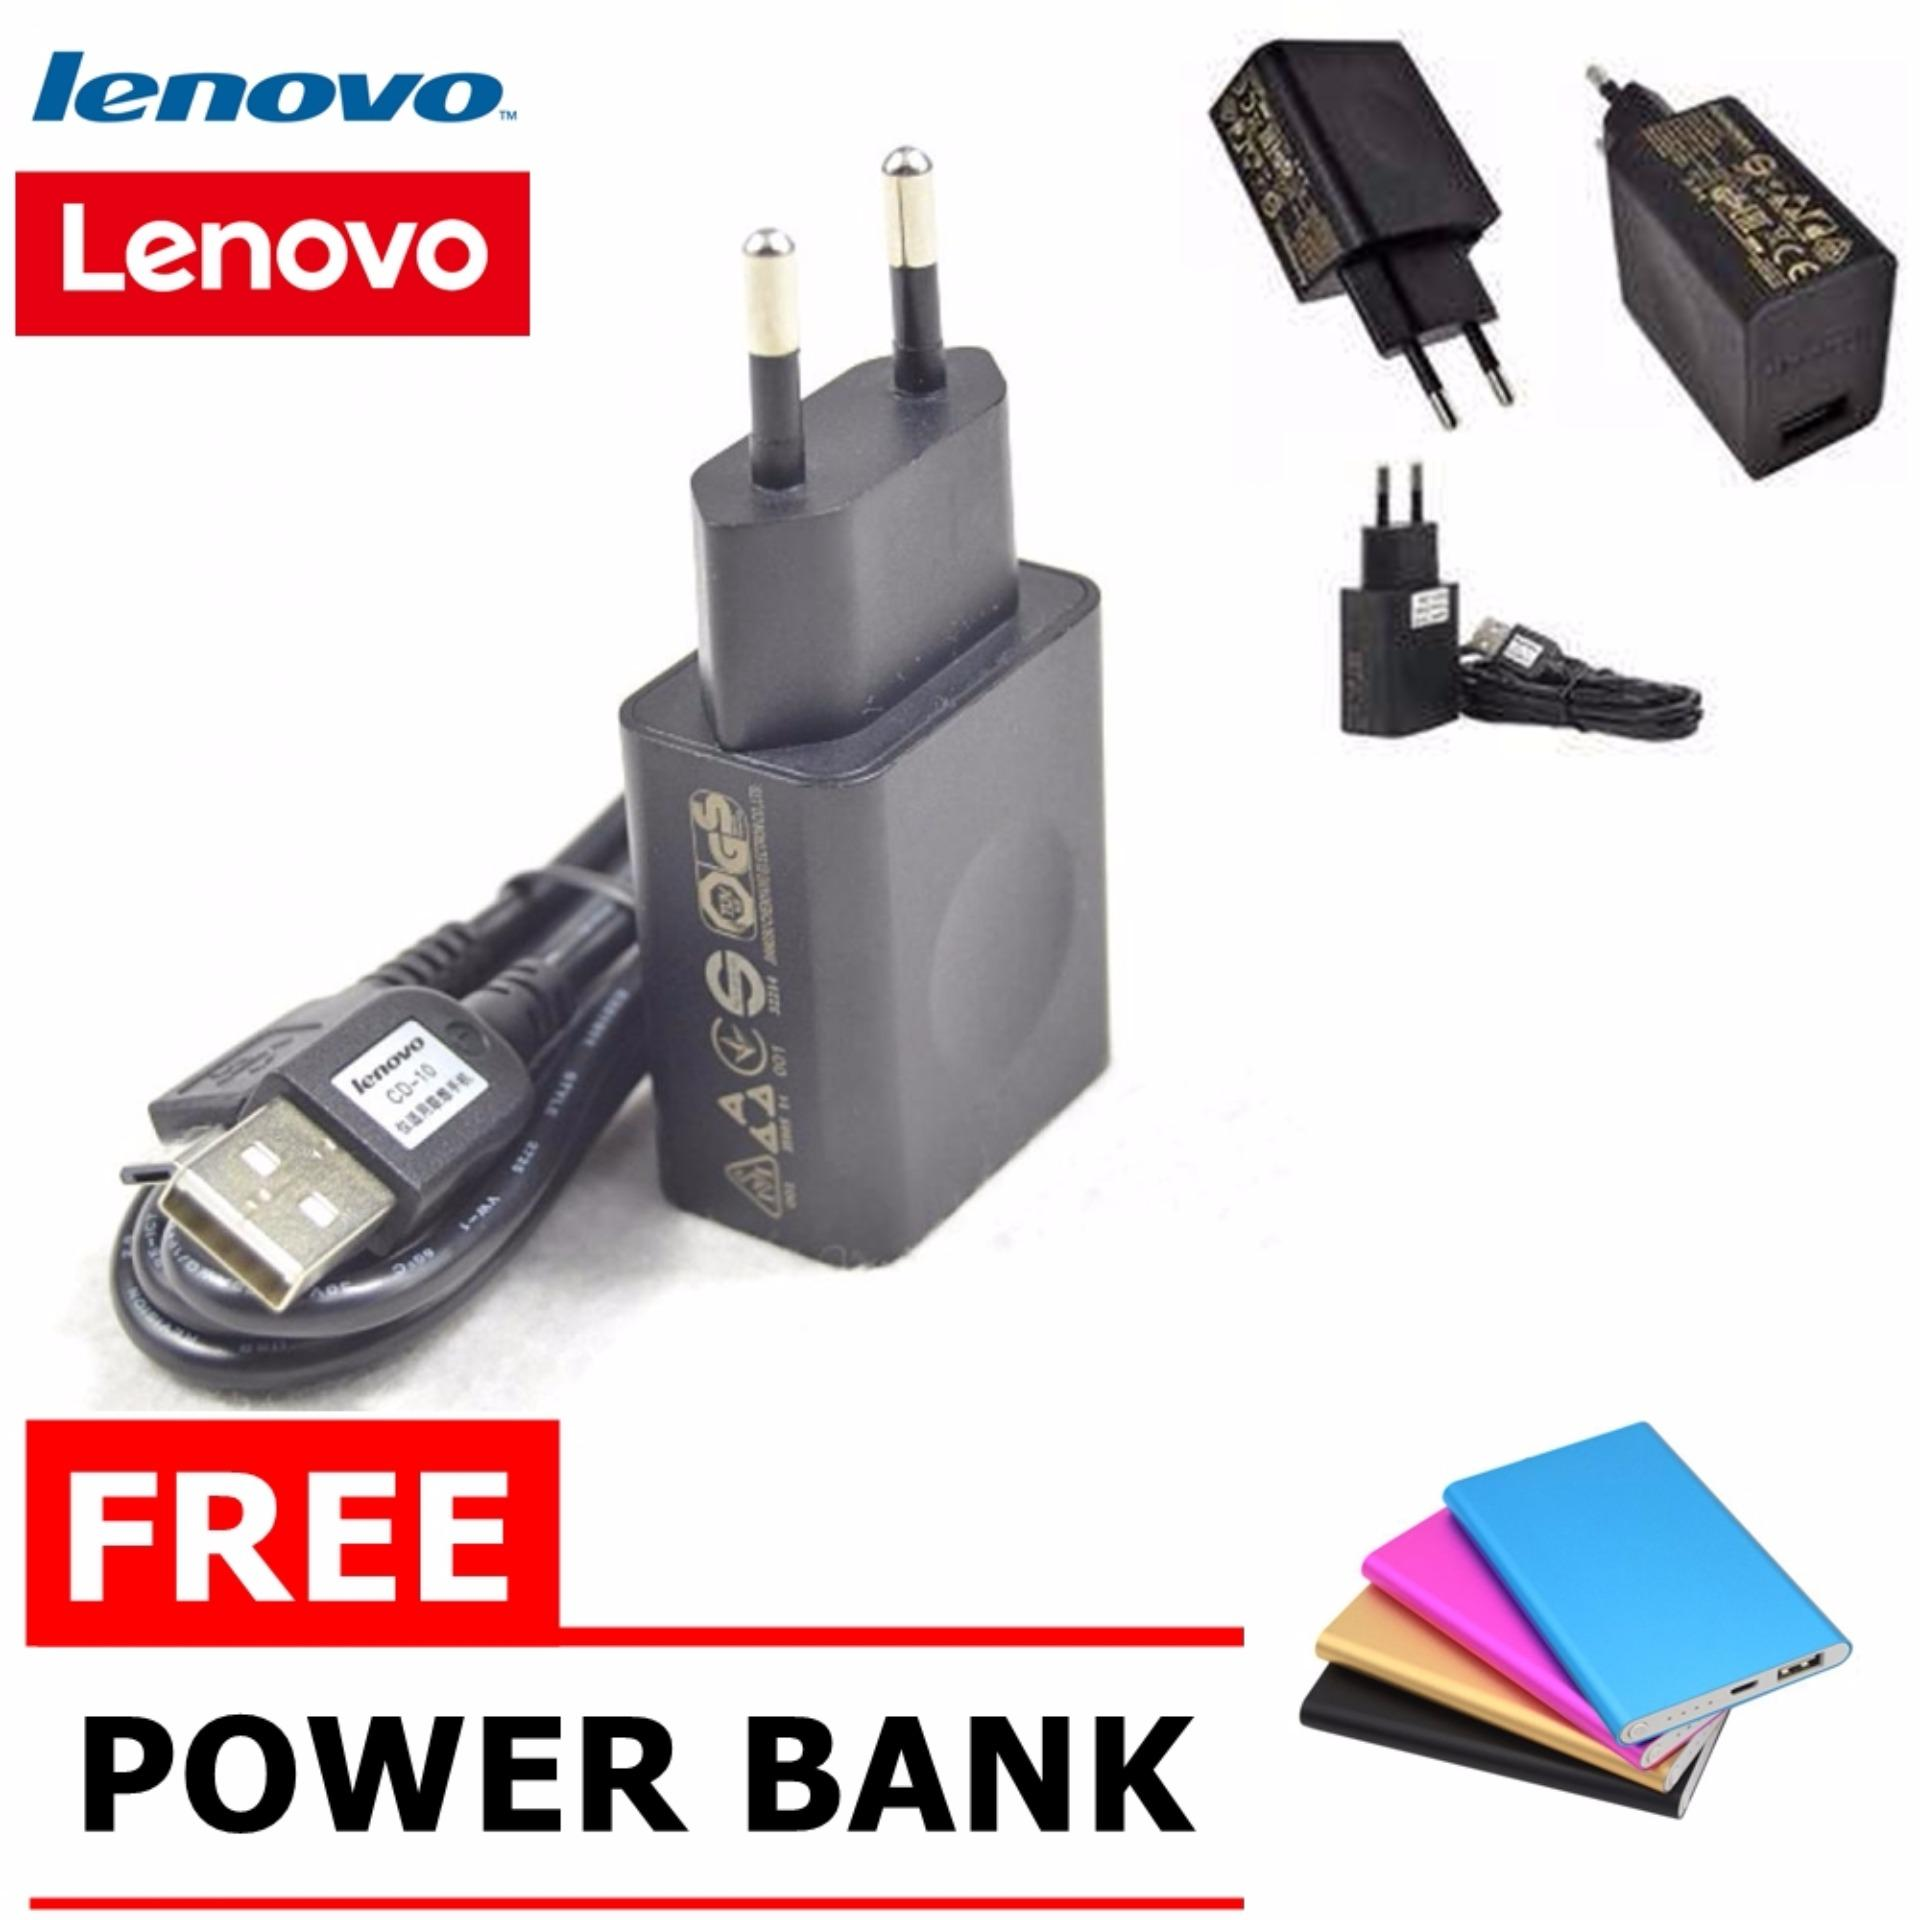 Lenovo Travel Charger Micro USB 2 A Original Hitam Free Power bank slim